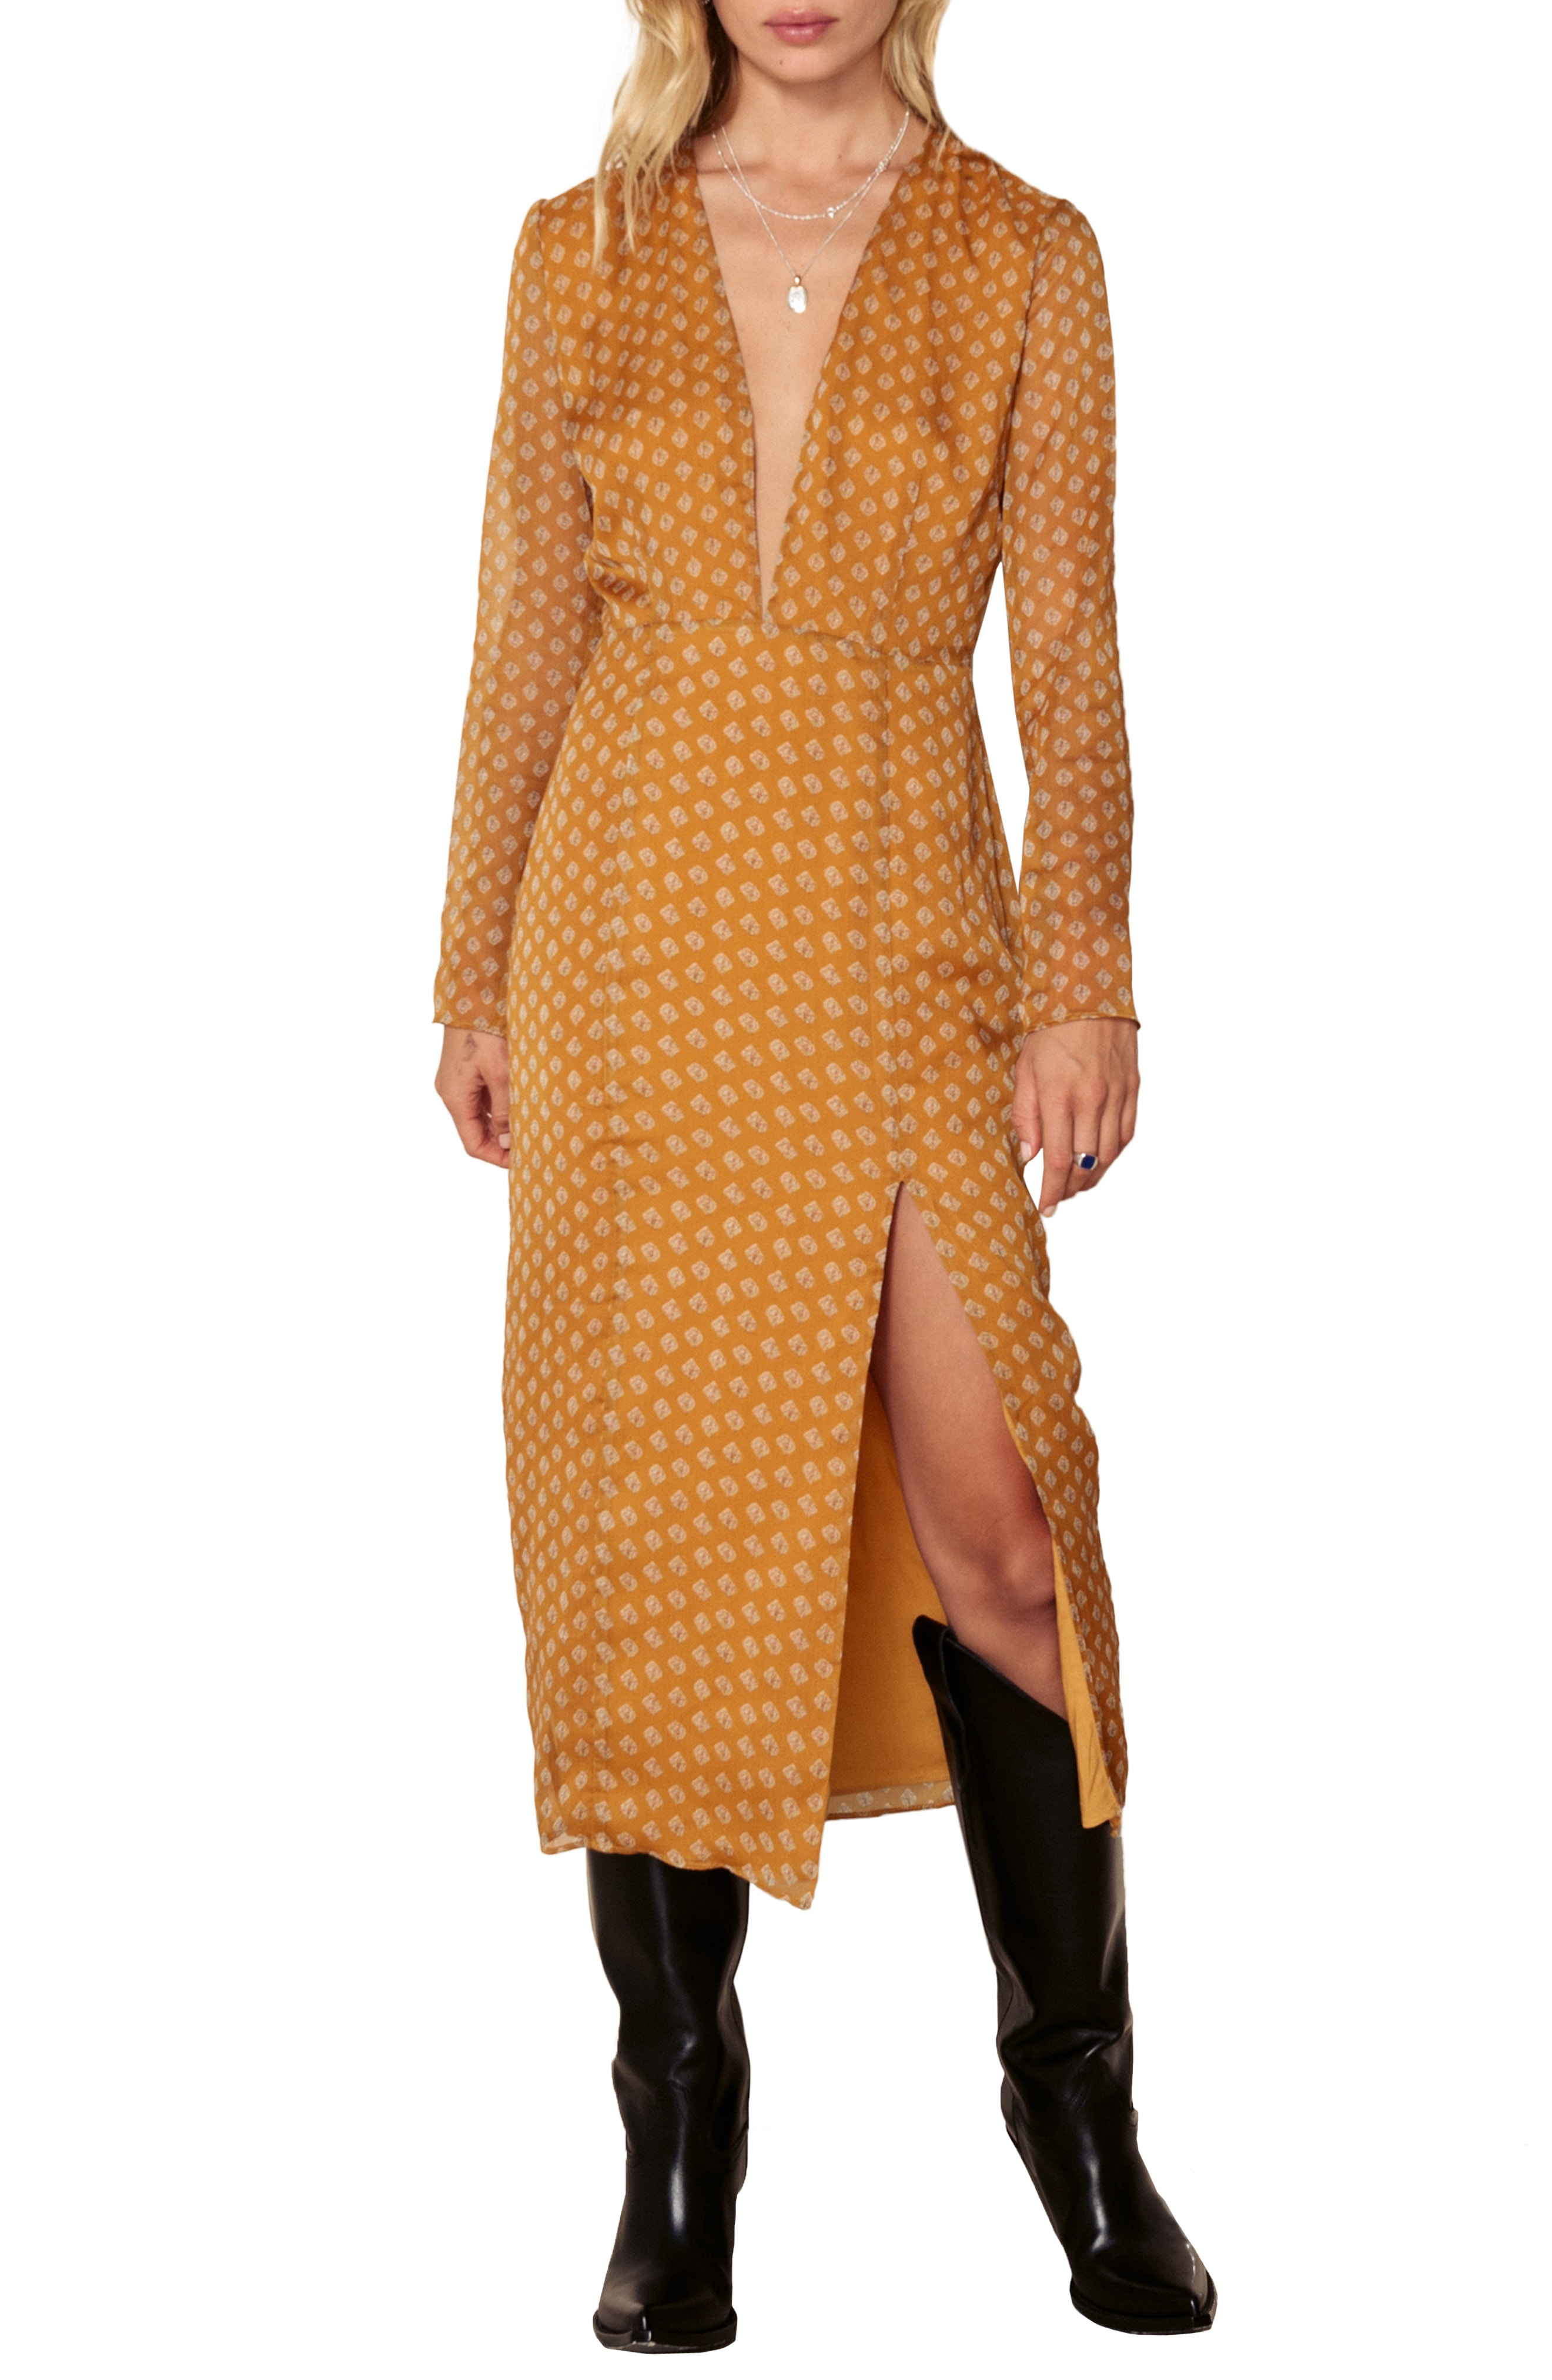 The East Order Blaire Midi Dress